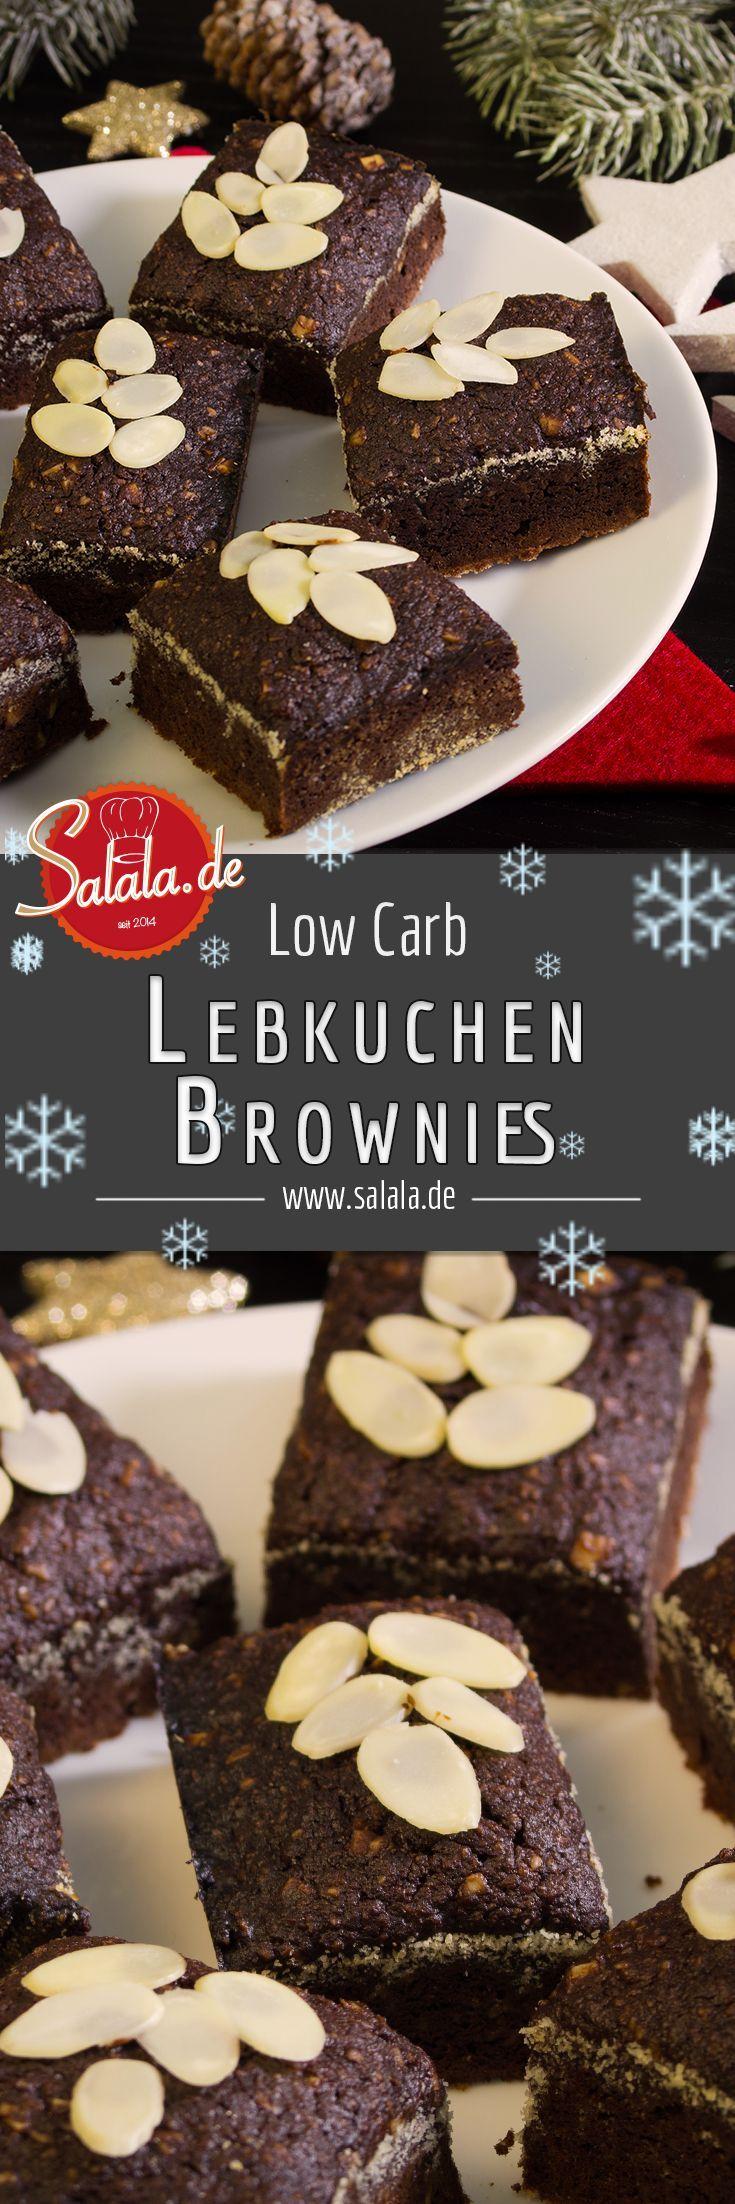 Lebkuchen Brownies - Low Carb und glutenfrei   salala.de – Low Carb leicht gemacht